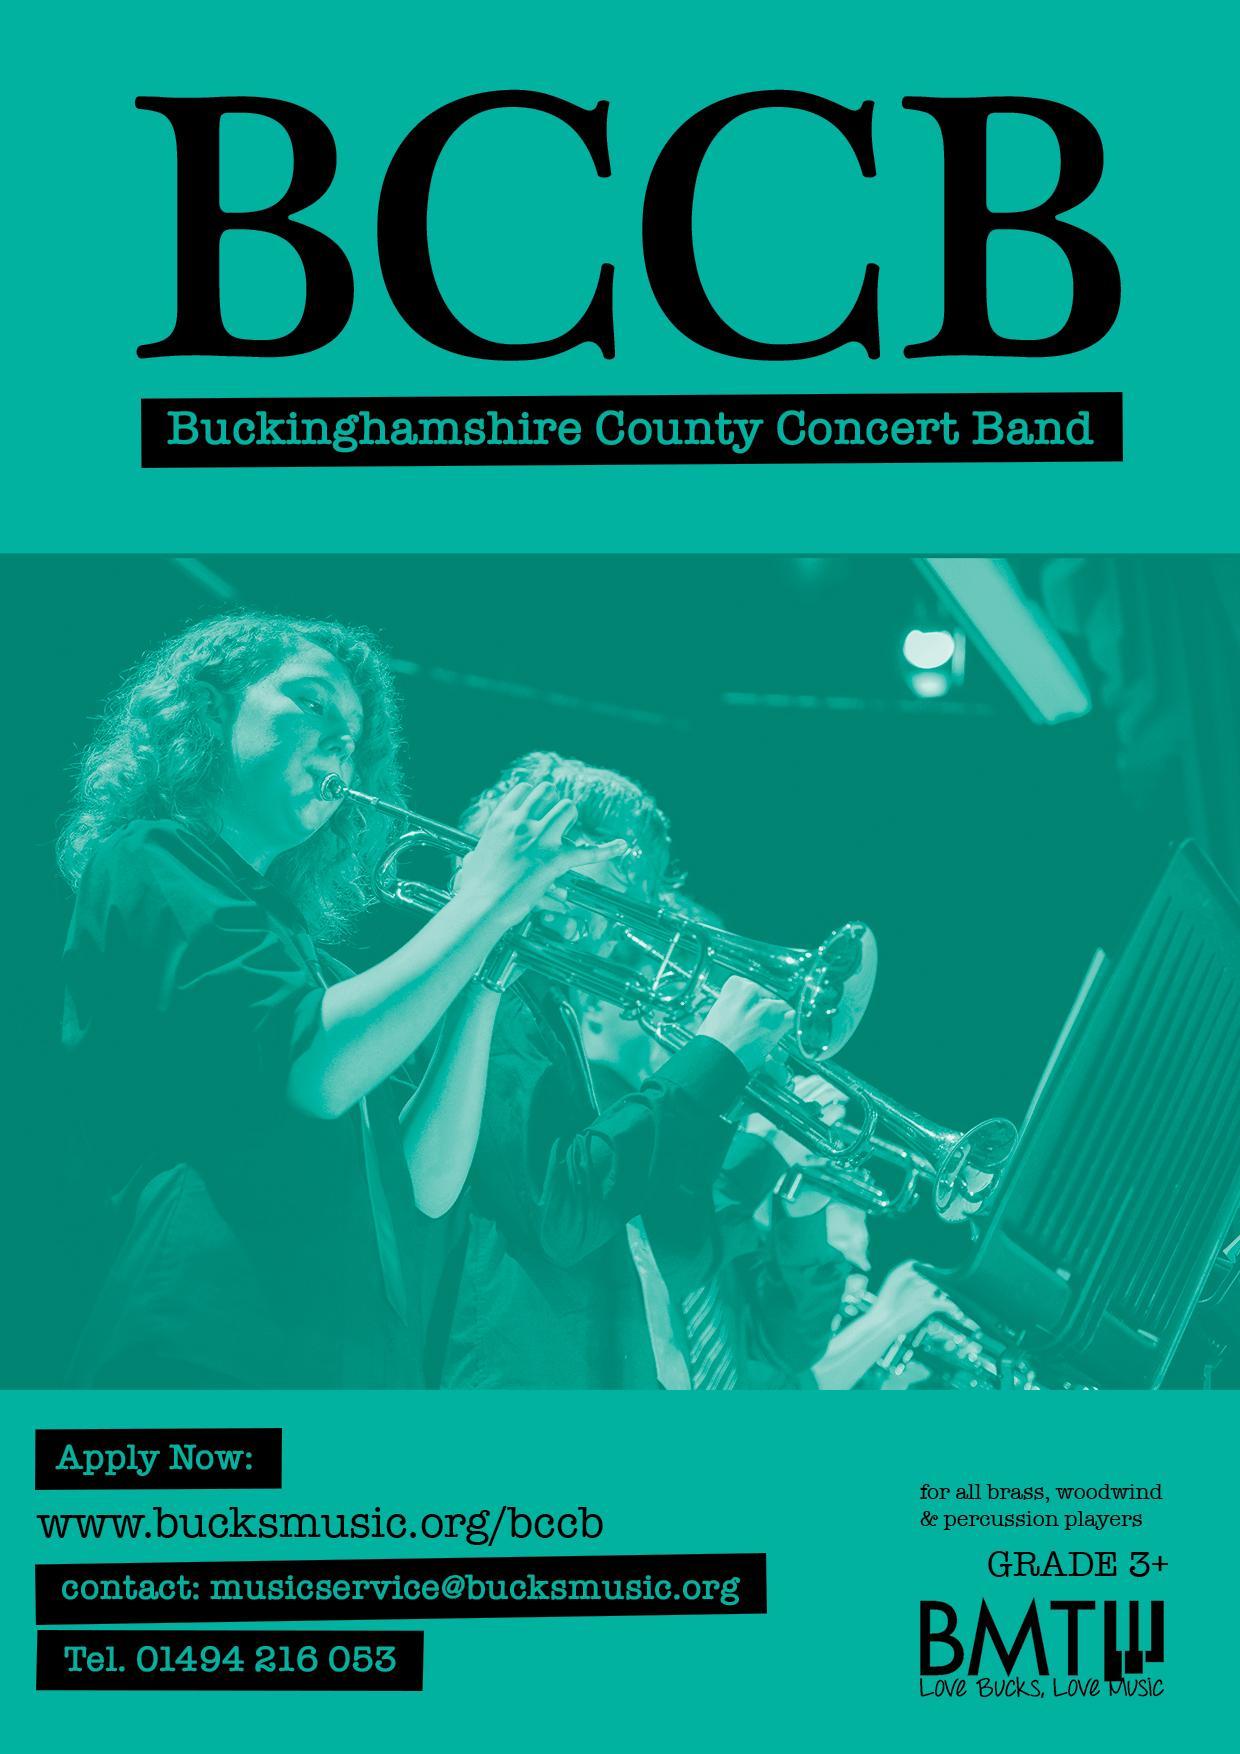 BCCB 2020 brass_Page_1